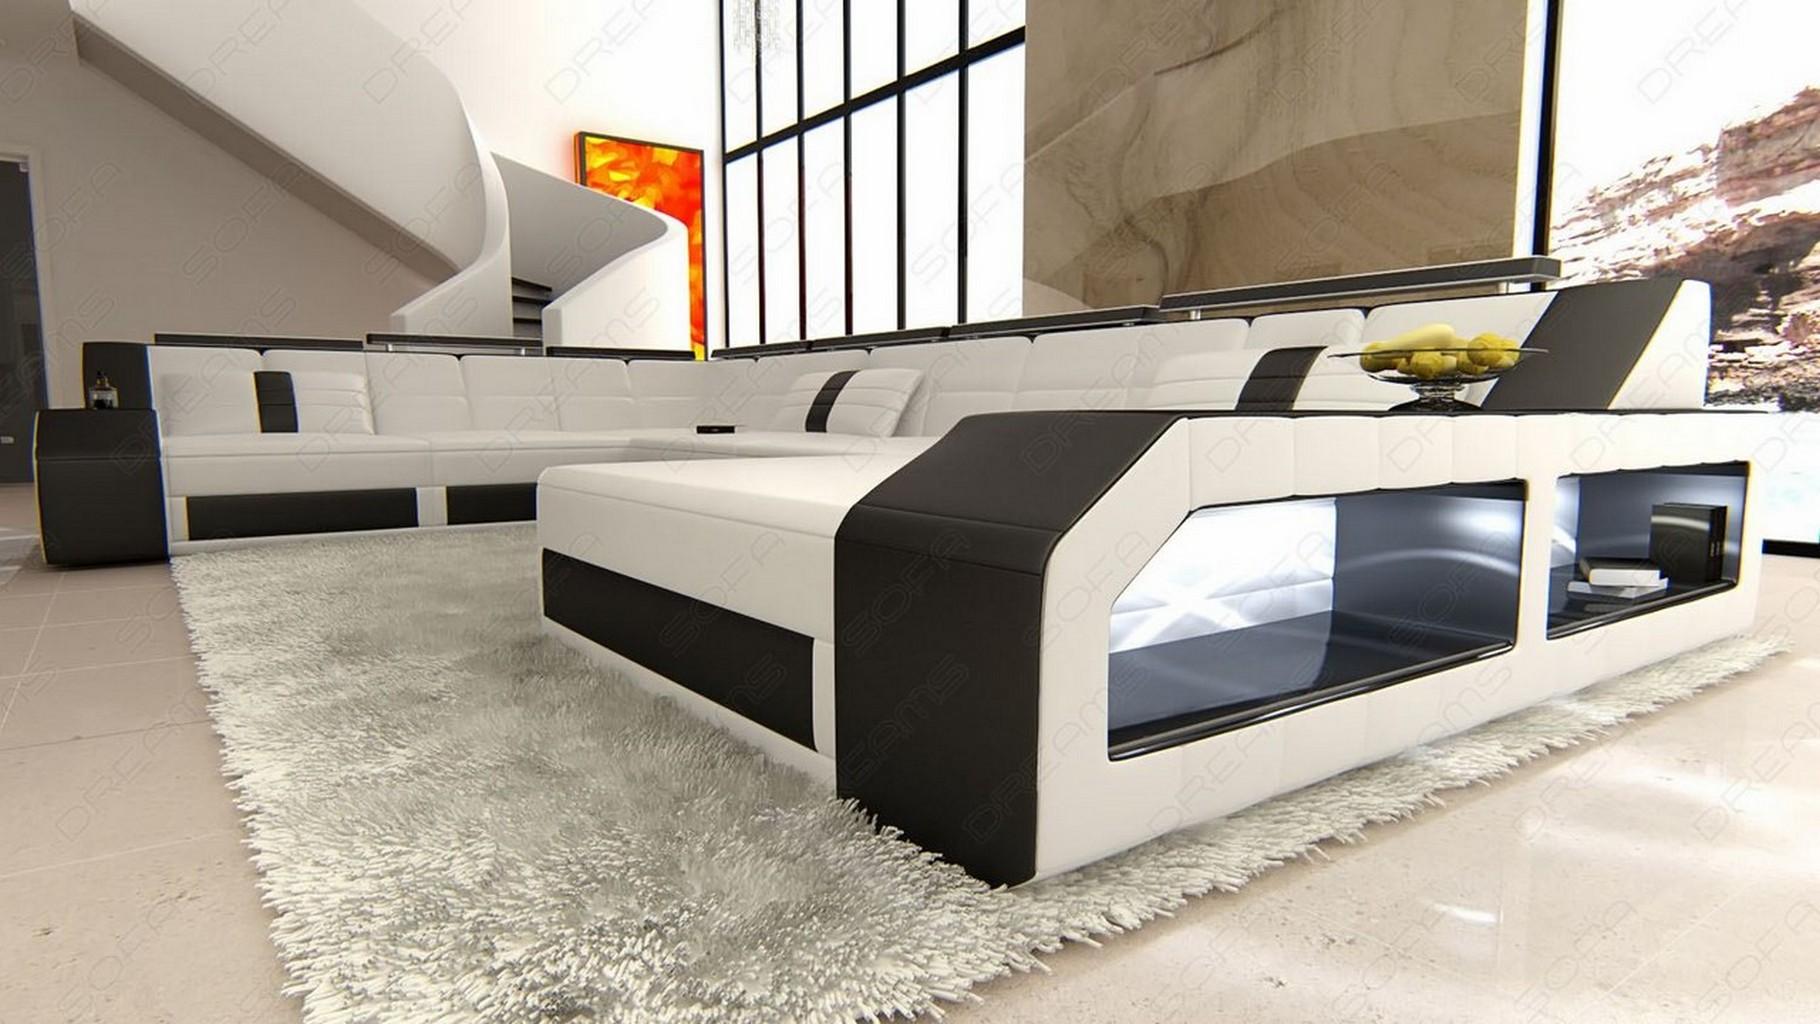 leather sofa interior design matera u shaped with led lighting white black ebay. Black Bedroom Furniture Sets. Home Design Ideas